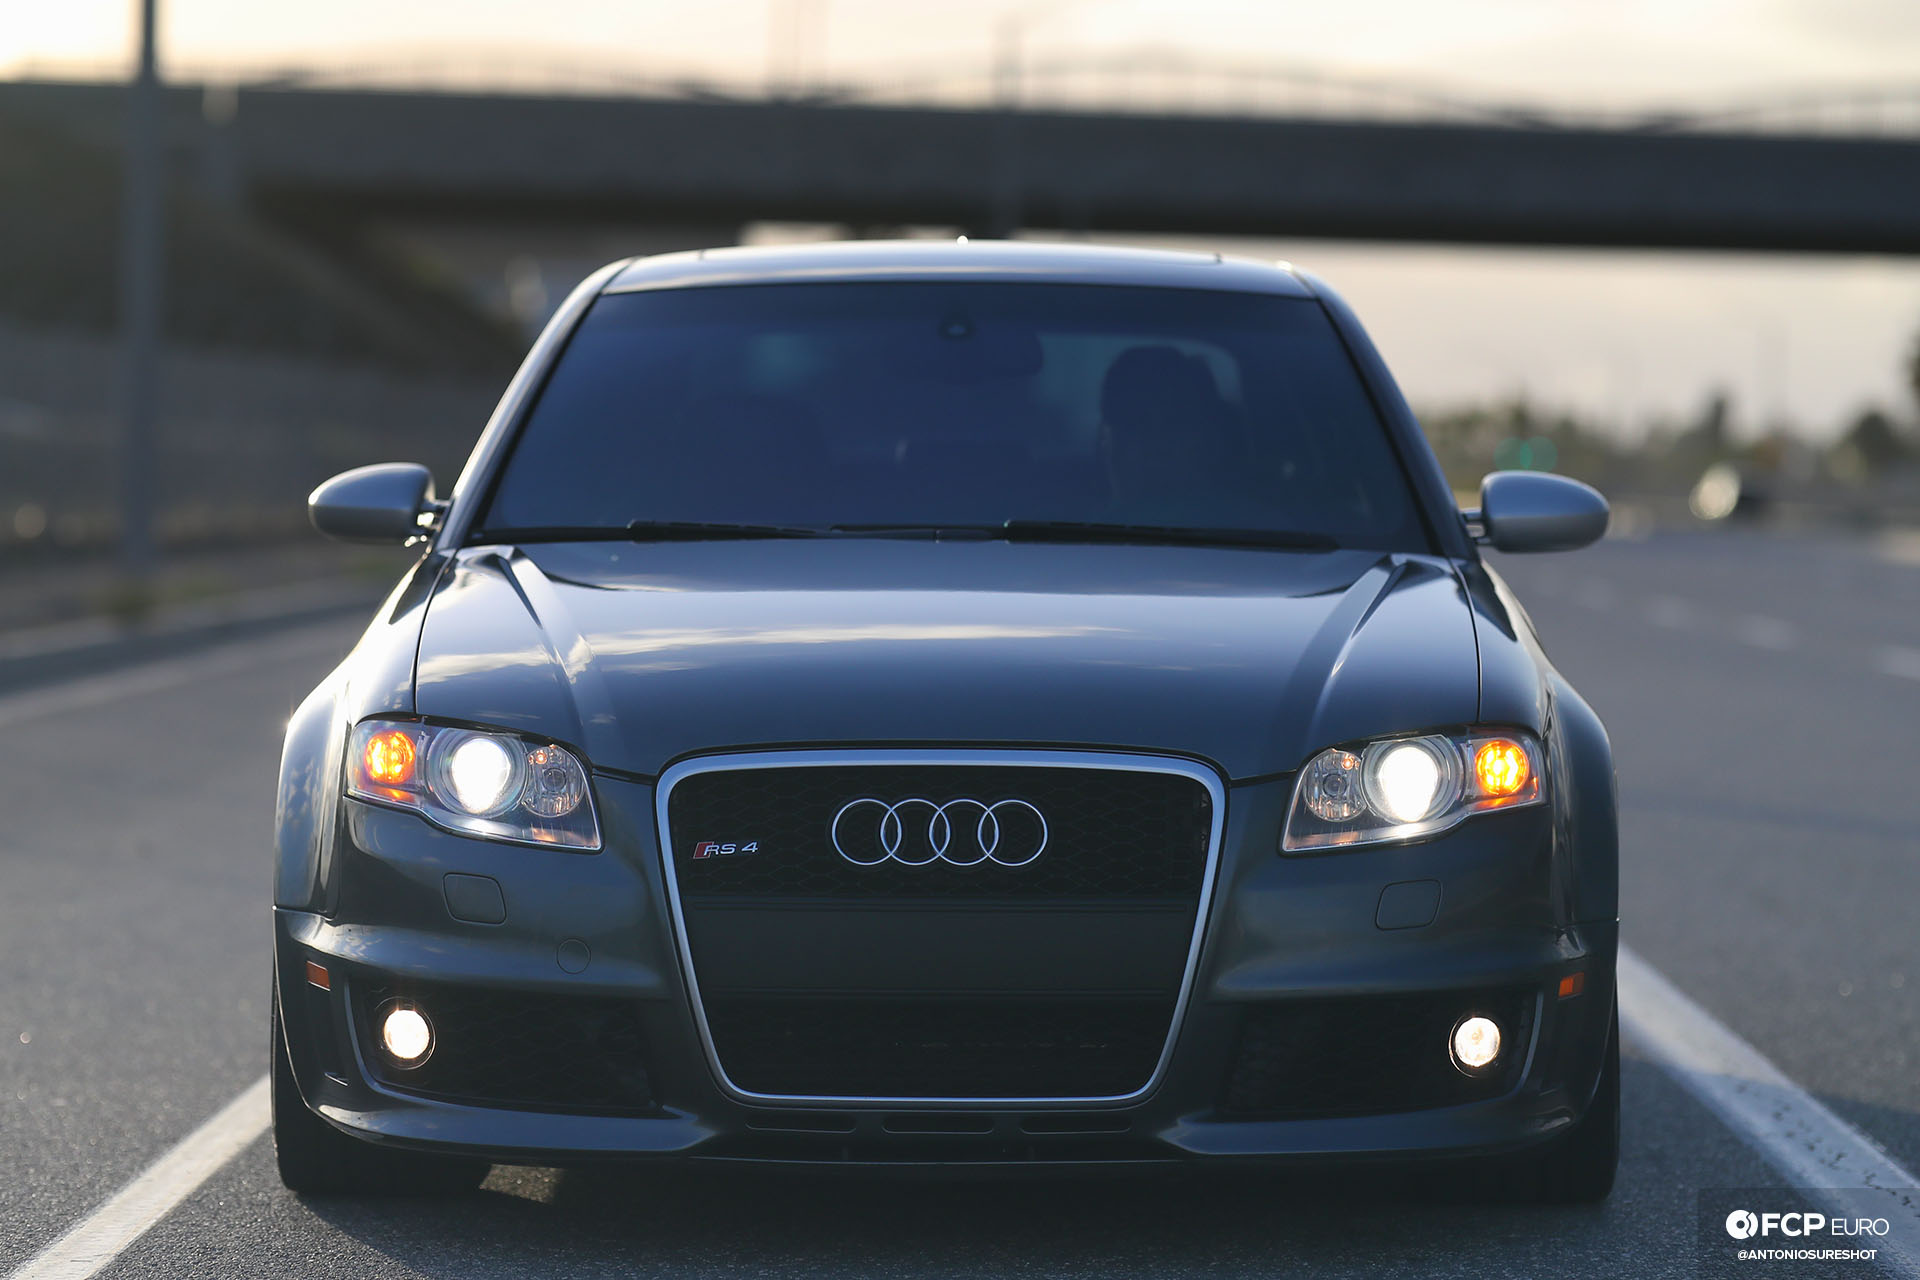 Audi B7 RS4 front shot